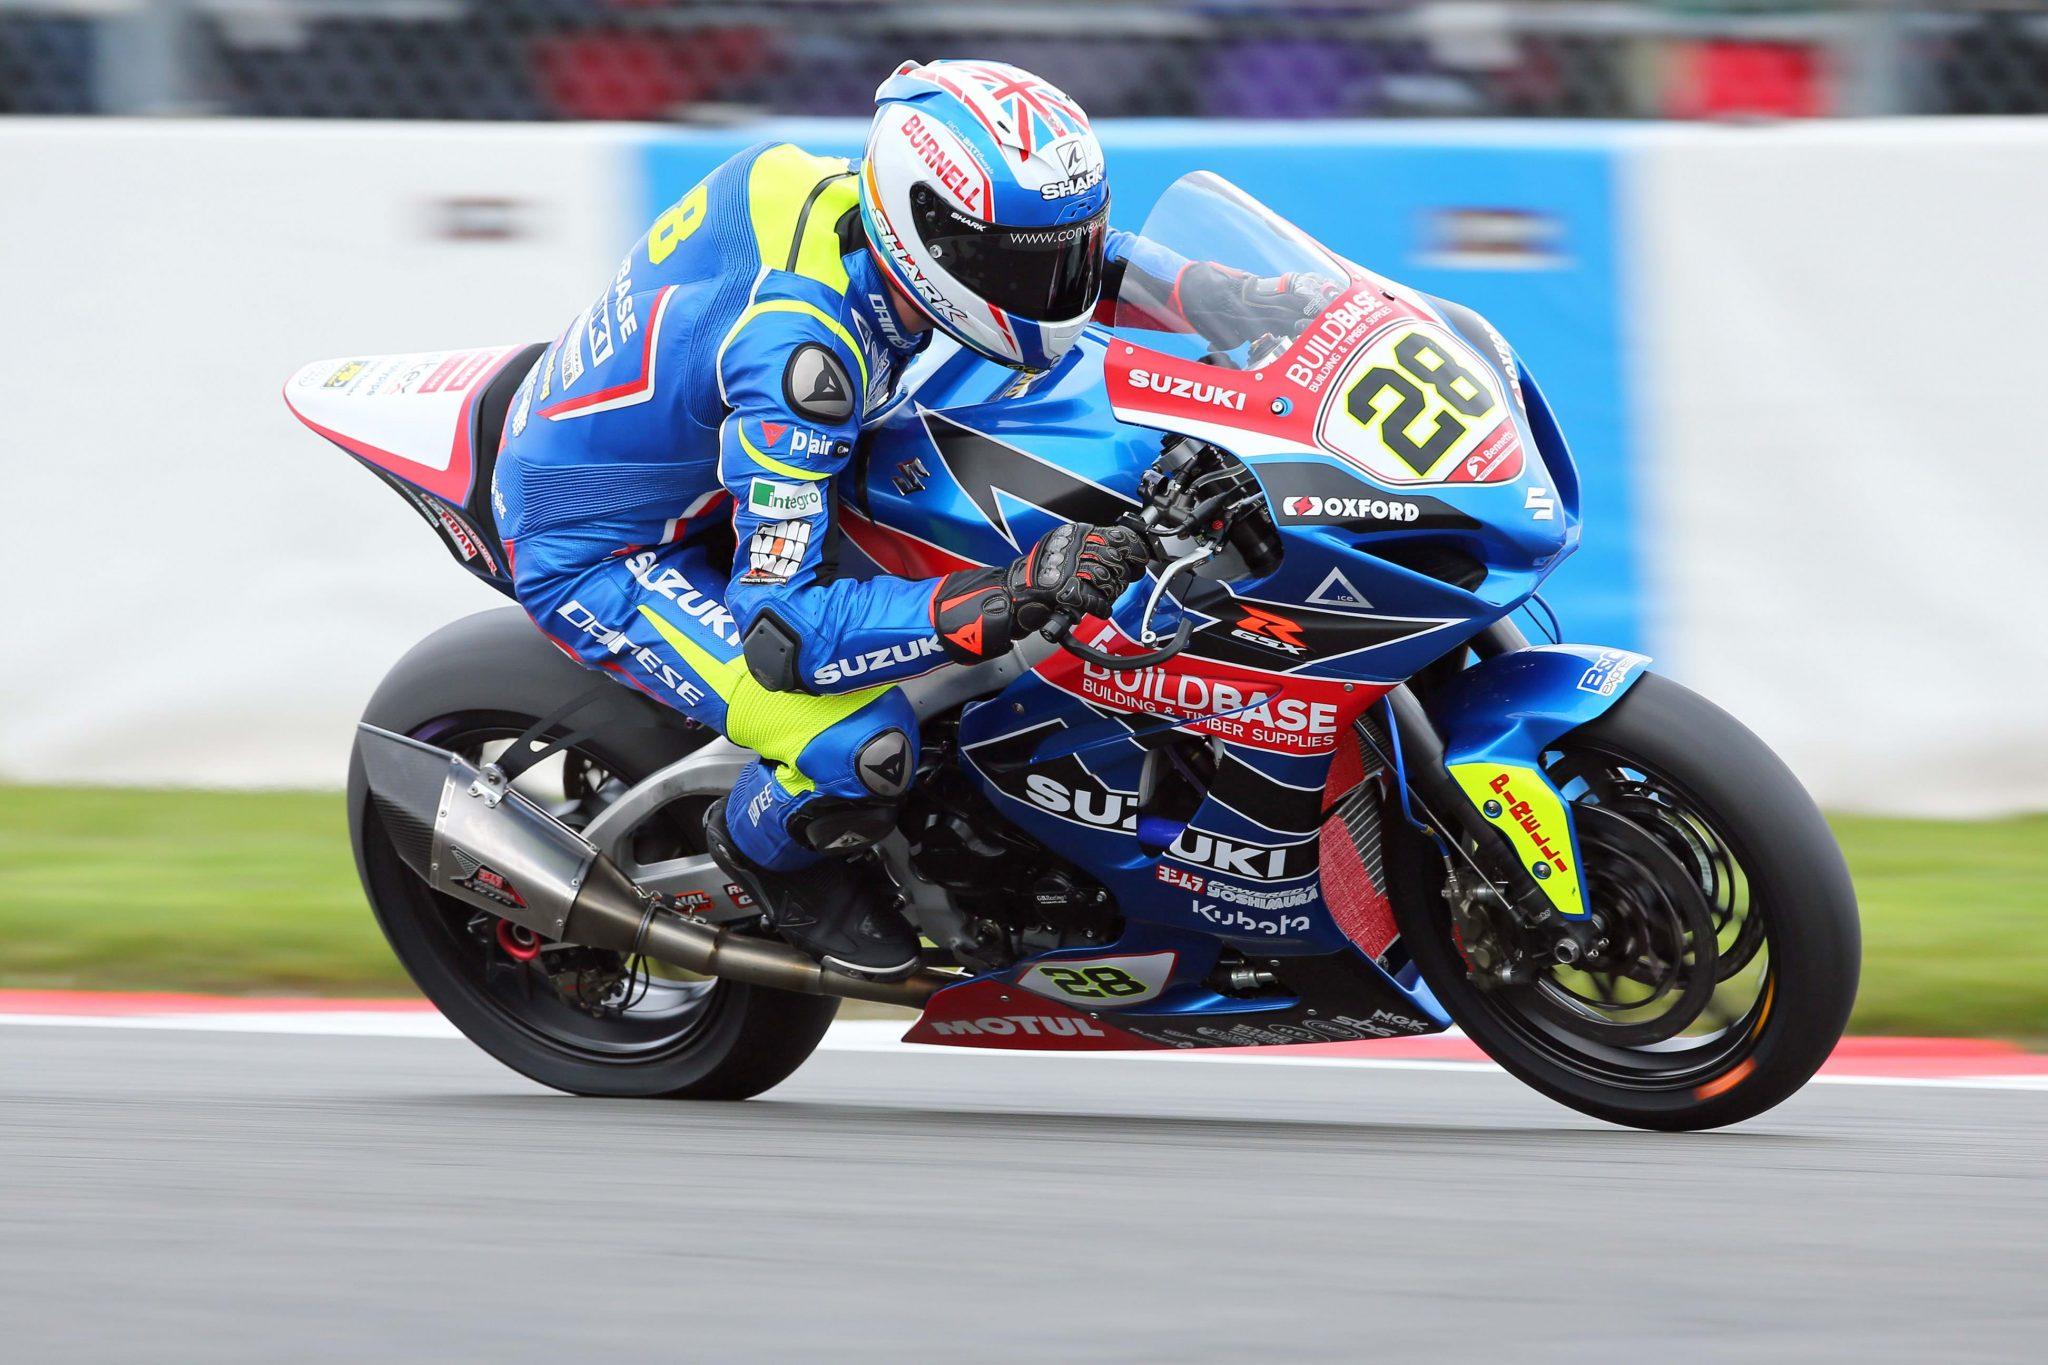 Brad Ray on Suzuki GSX-R1000 sport bike - race